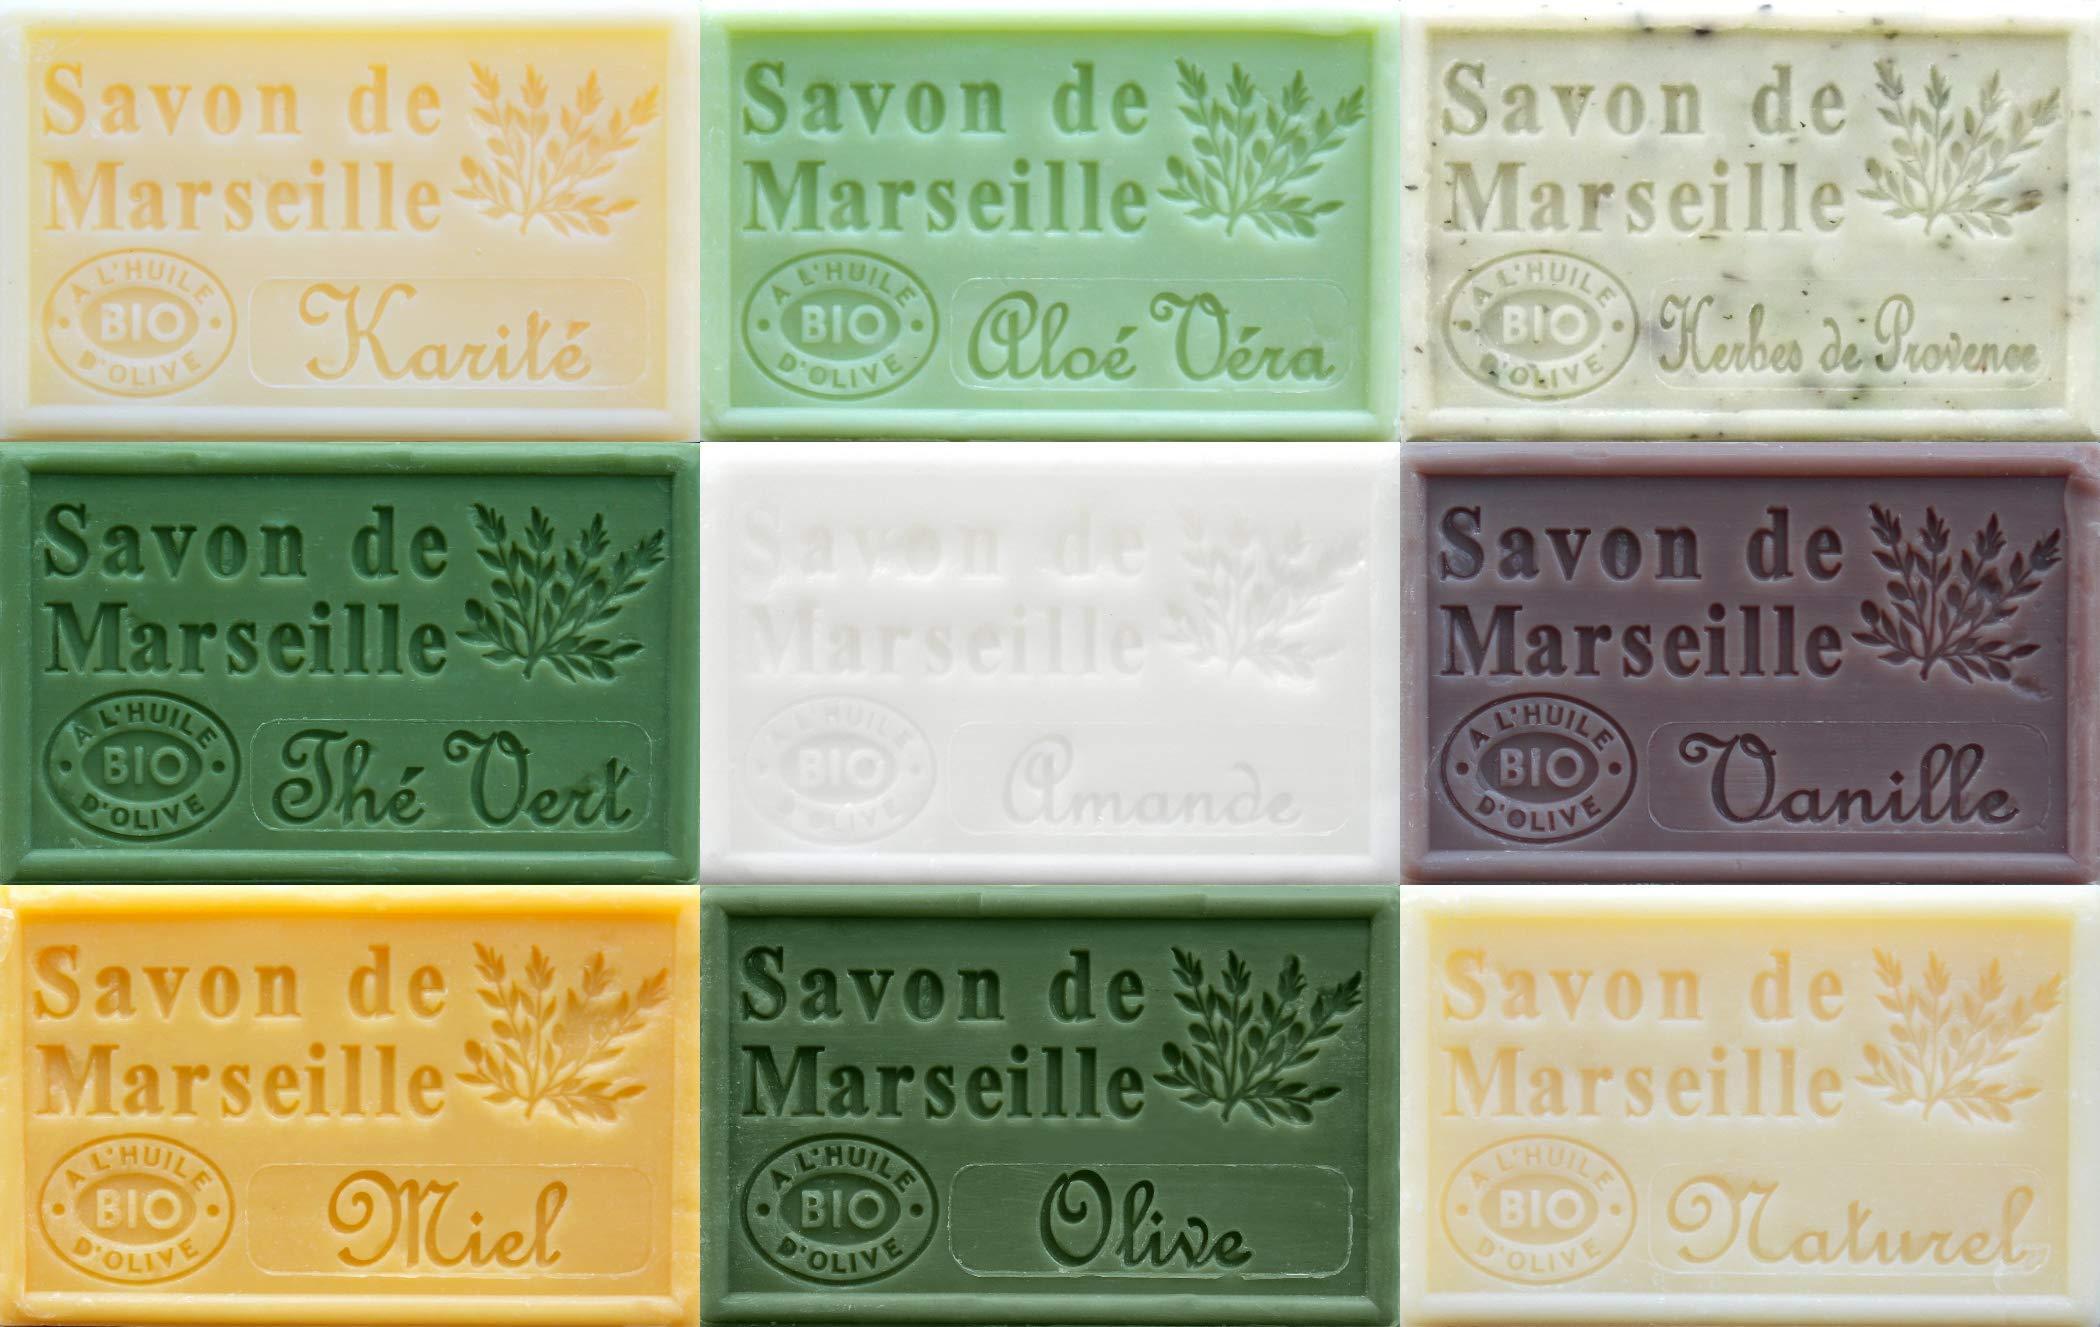 Savon de Marseille French Soaps, Boxed Set of 9 x 125g Soap Bars (Neutral Fragrances), Vegetable Soap, Plastic Free